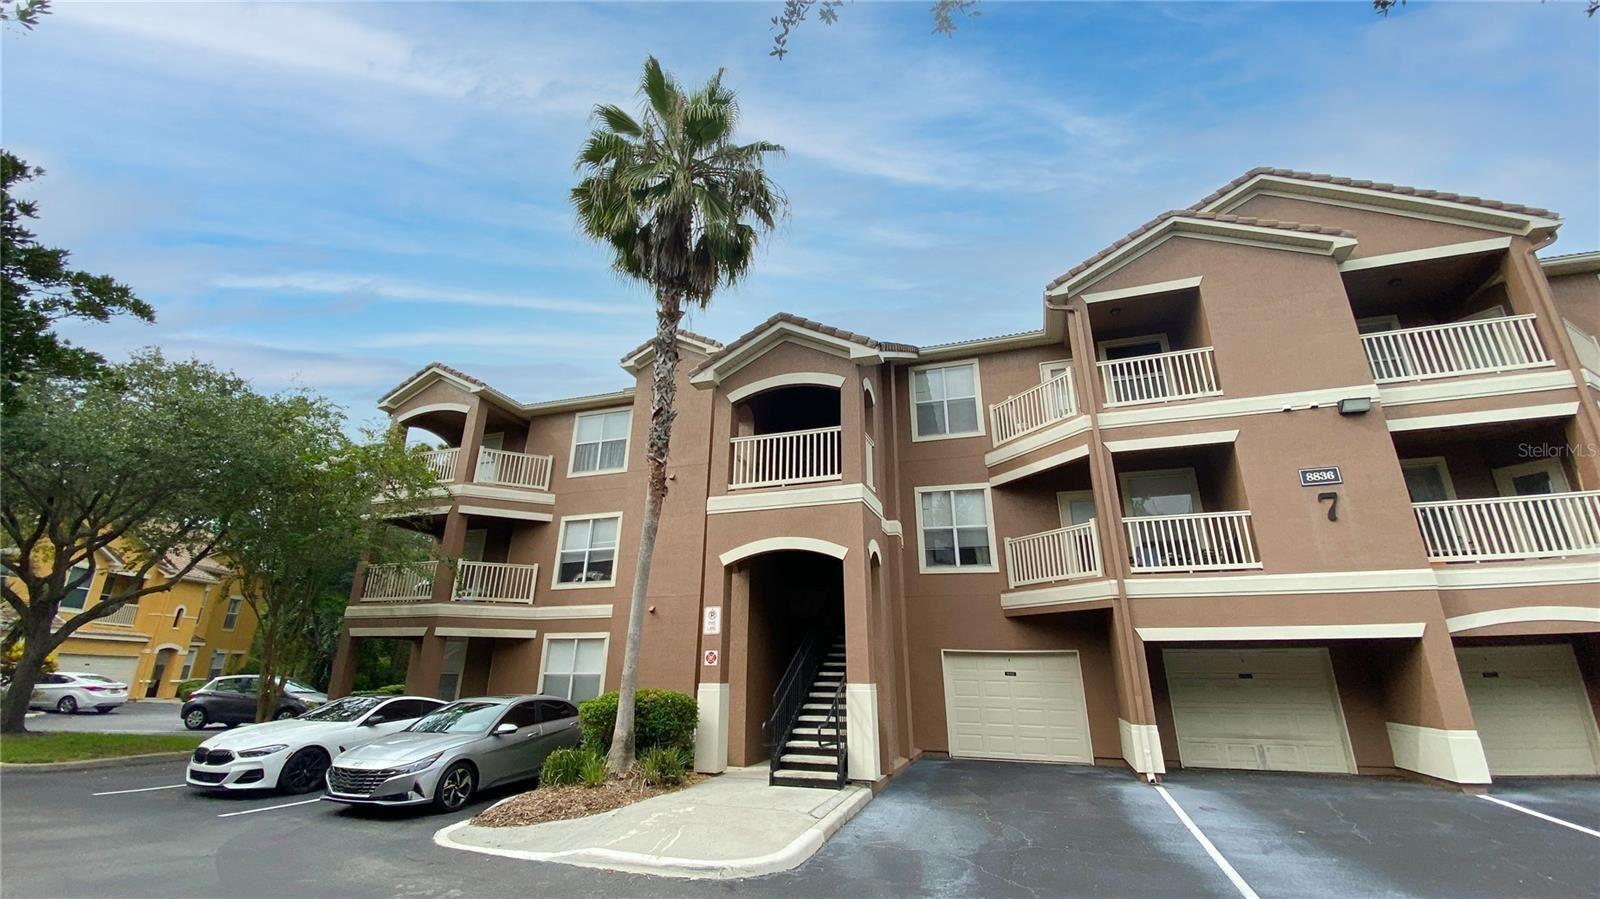 8836 VILLA VIEW CIRCLE #303, Orlando, FL 32821 - MLS#: S5055537